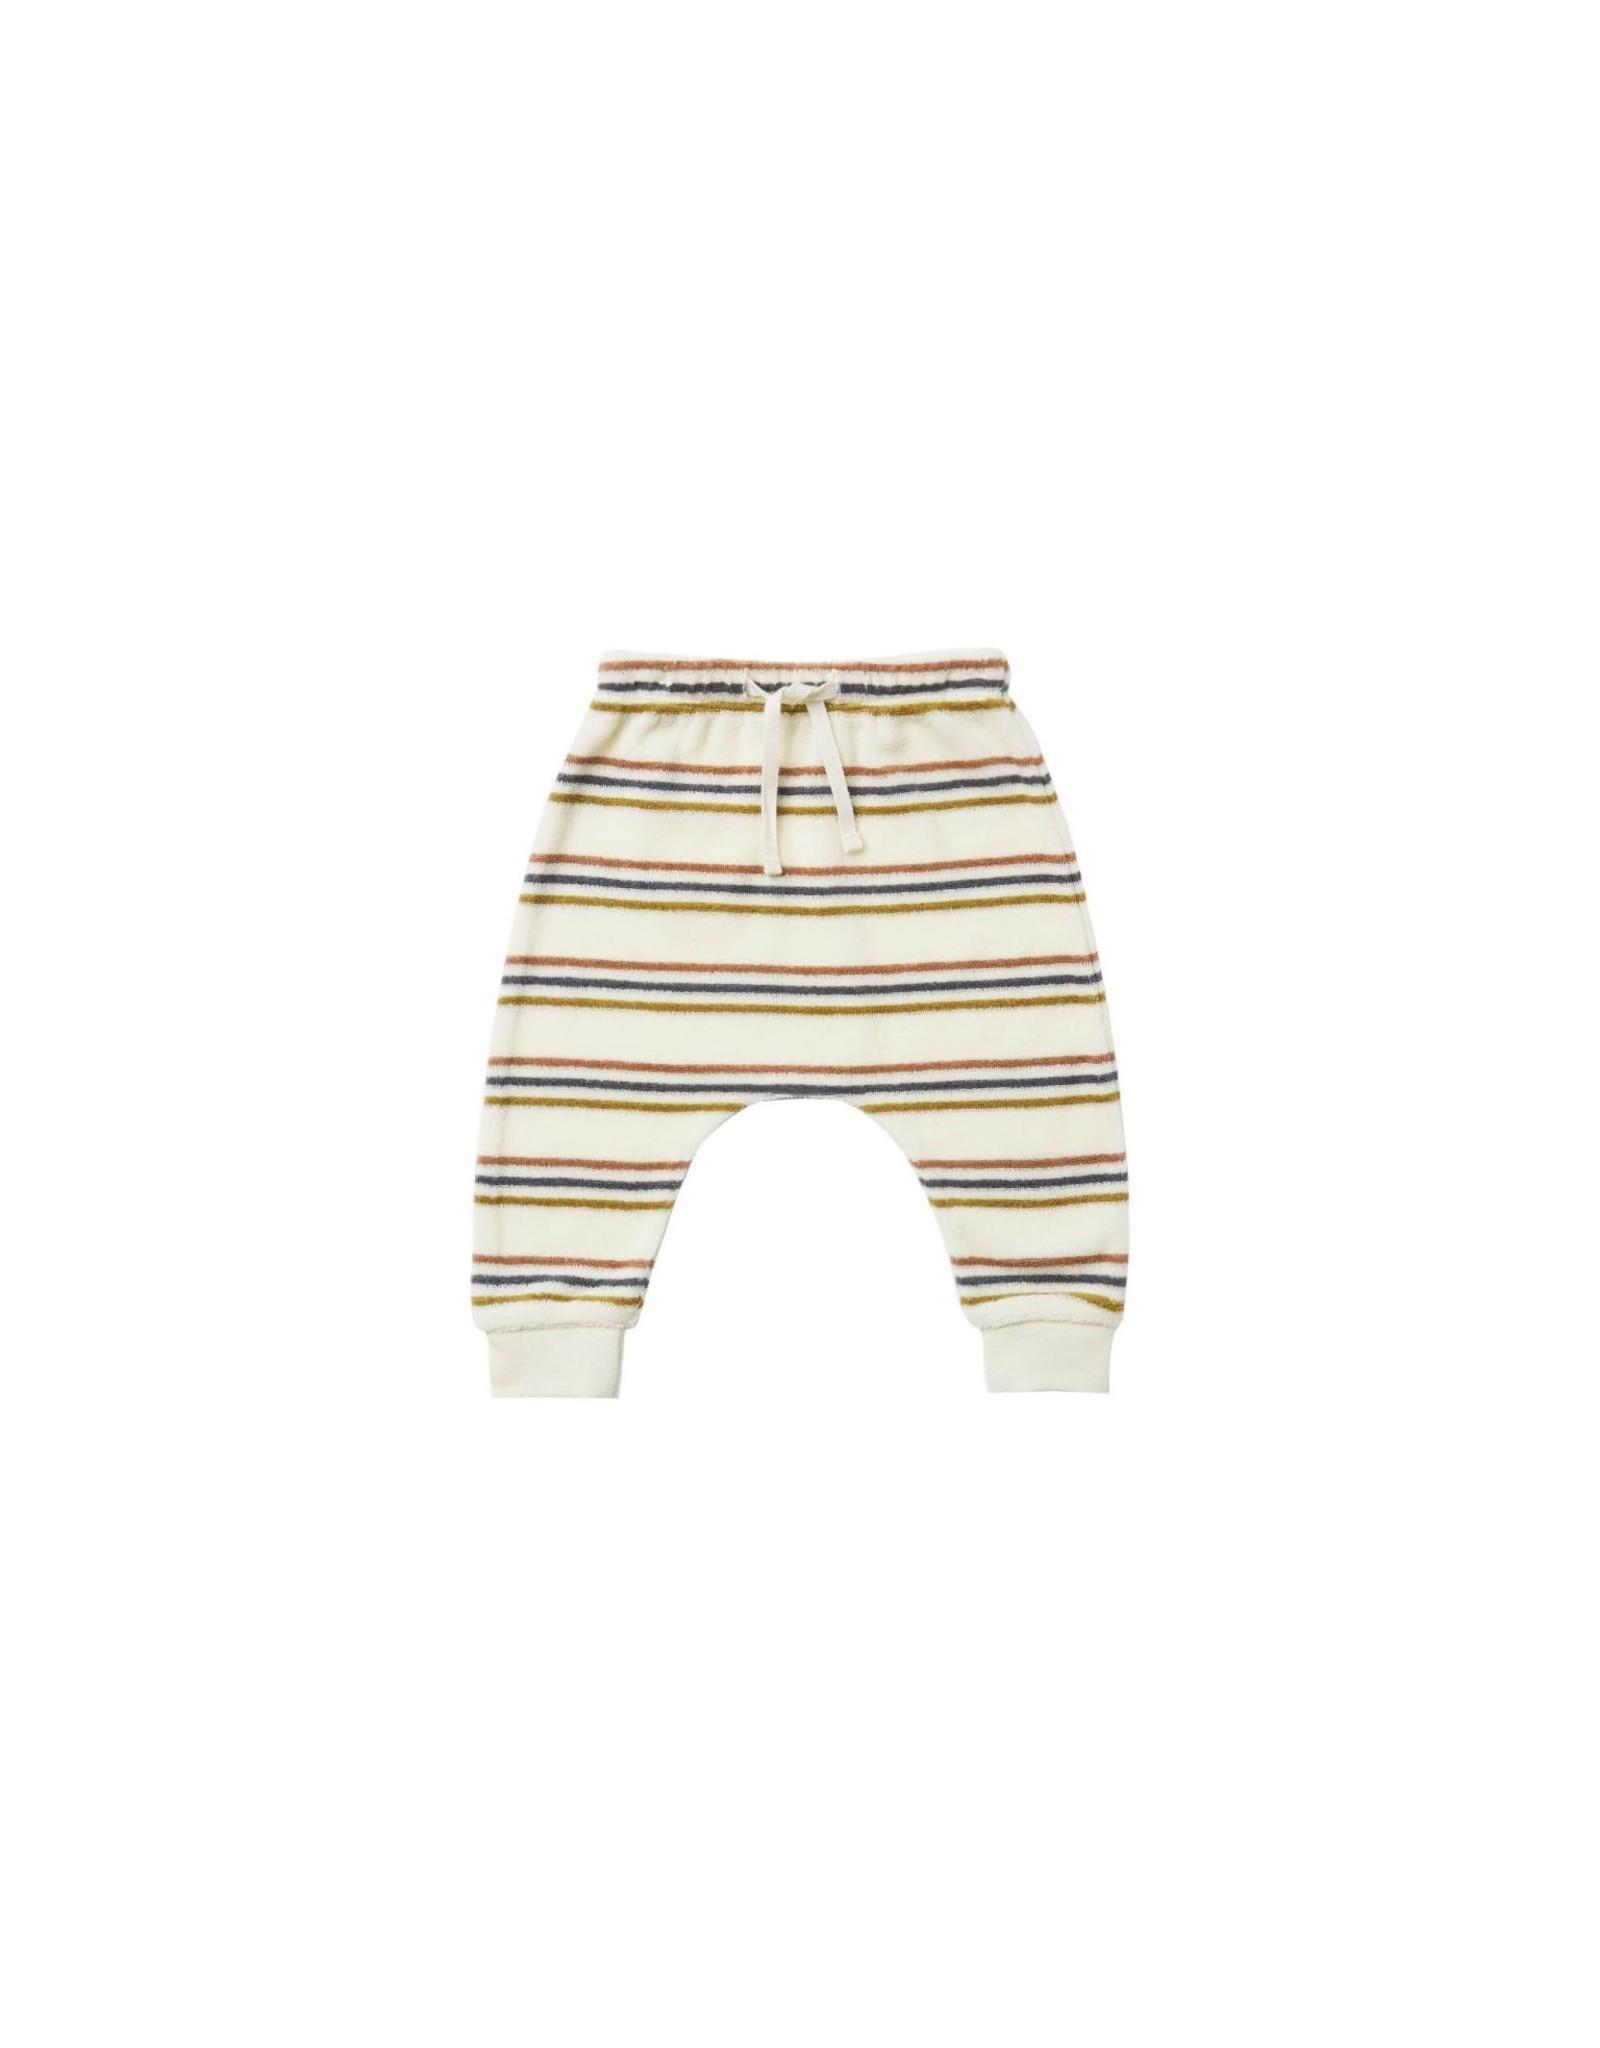 Quincy Mae sweatpant- retro stripe